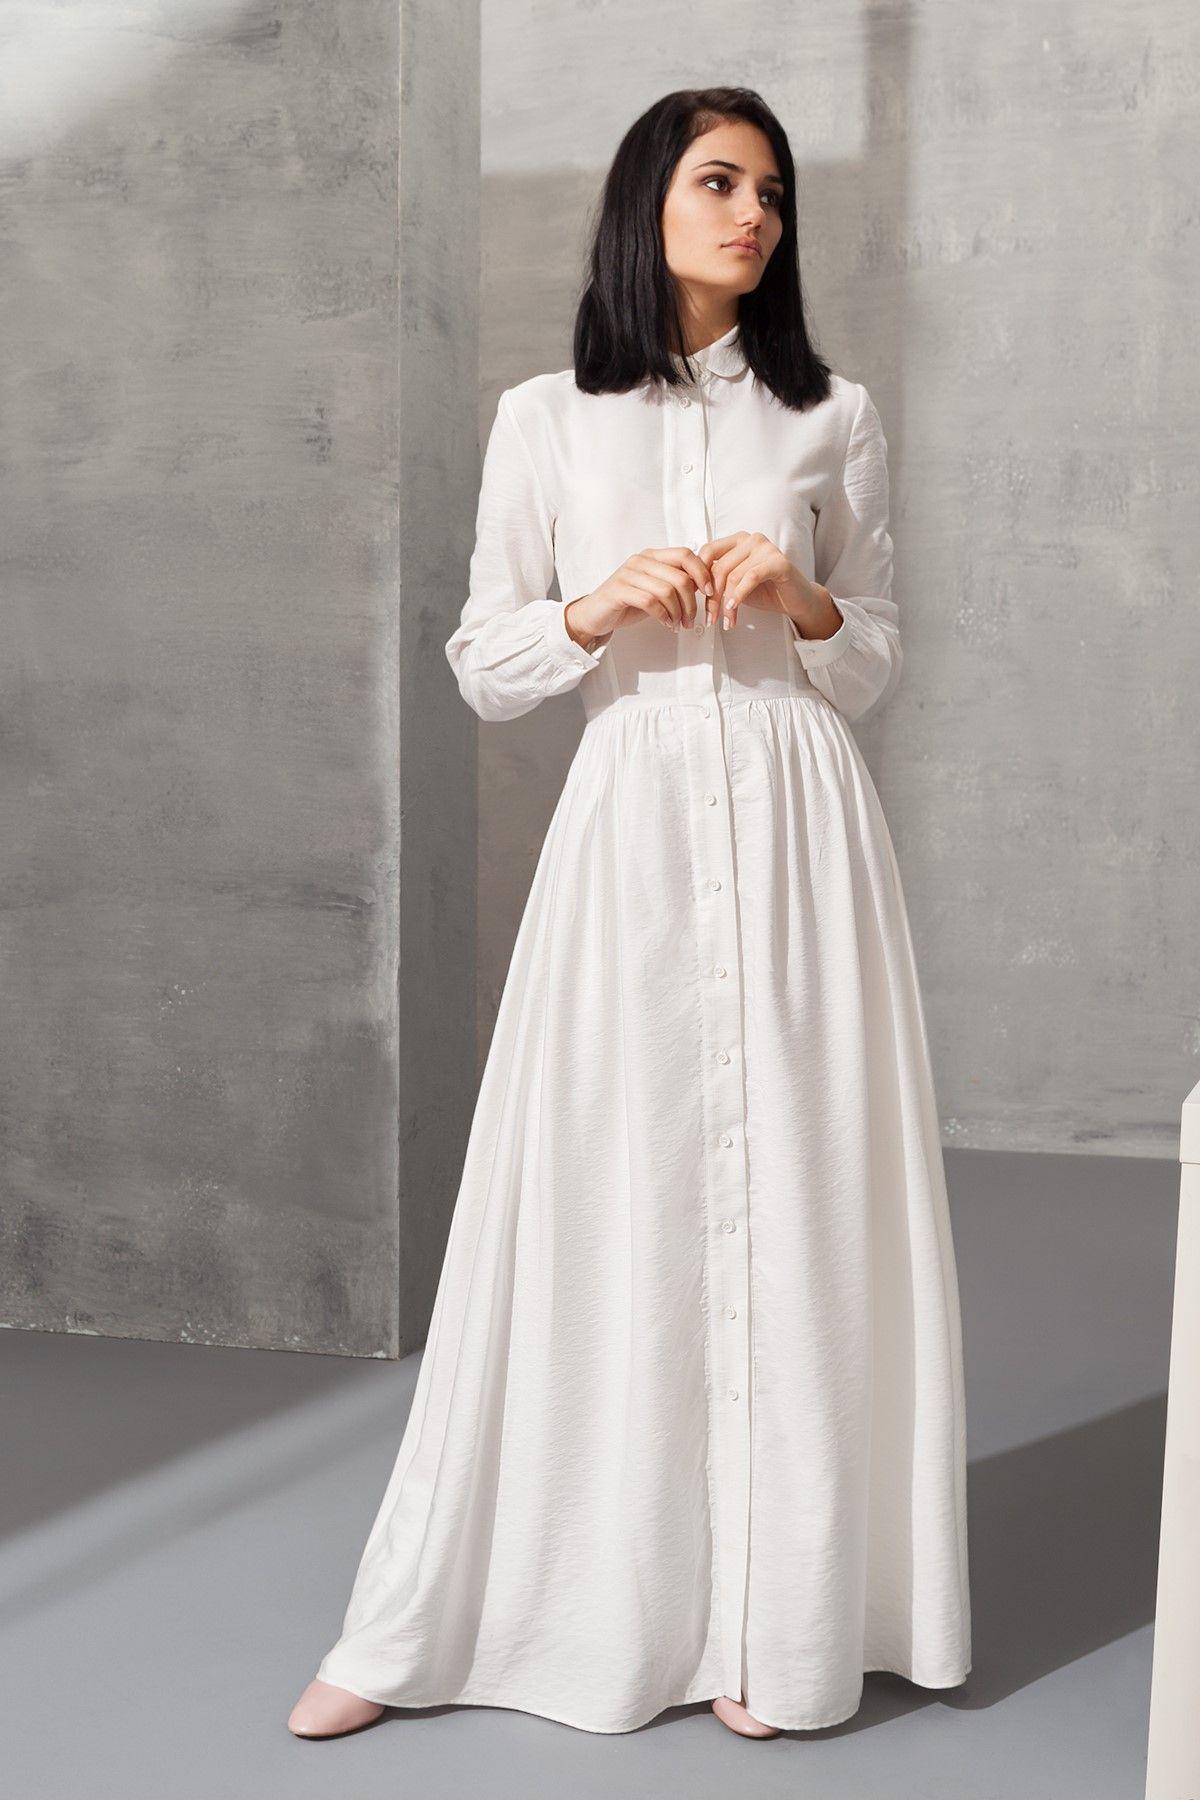 Beyaz Elbise Vavss1600513 Fiyat 129 99 Https Www Trendyol Com Beyaz Elbise Vavss1600513 Urundetay 50279 21174243 Kadin Giyim Elbise Blazer Elbise